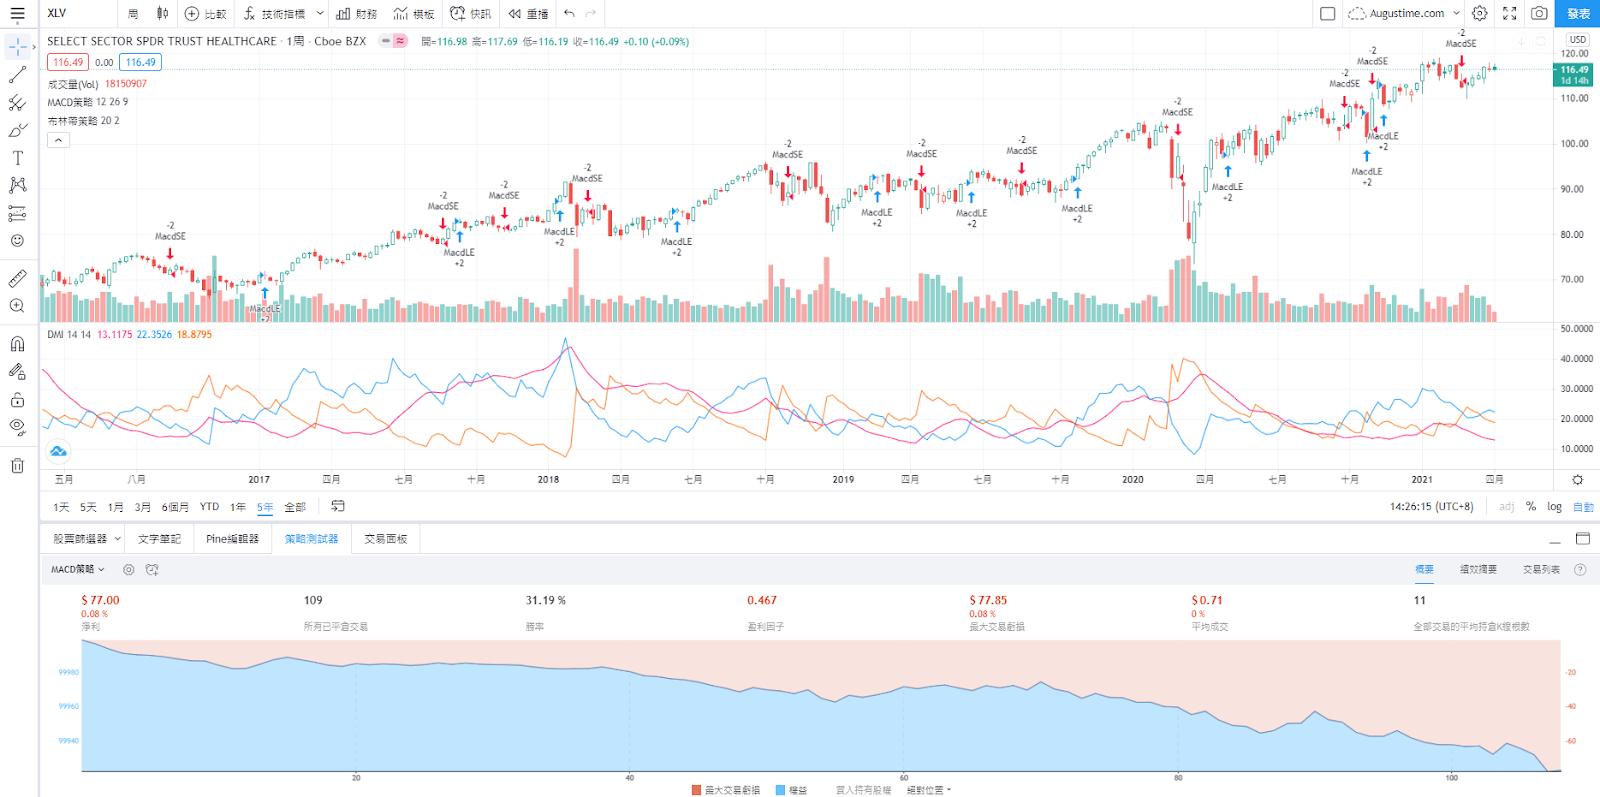 XLV股價走勢圖與K線圖